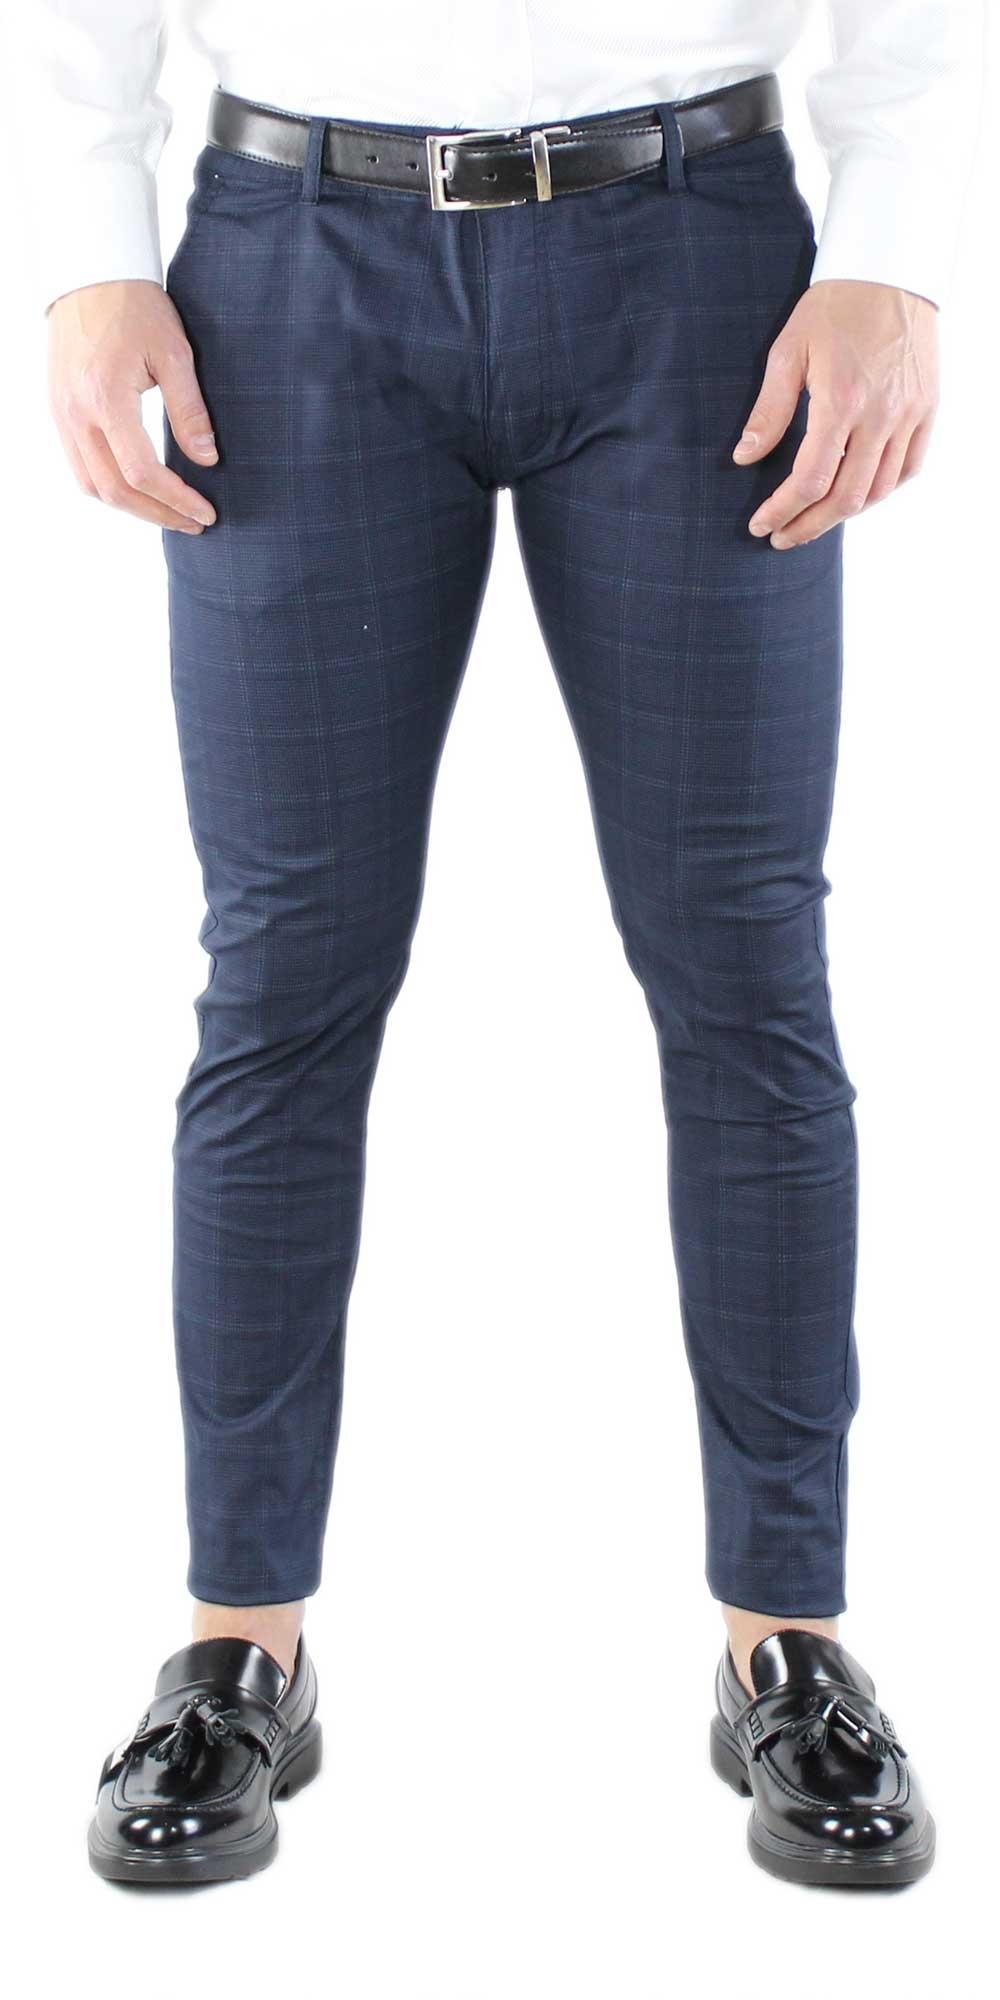 Pantaloni-Uomo-Chino-Silm-Fit-Estivi-a-Quadri-Pantalone-Elegante-Sartoriale miniatura 3